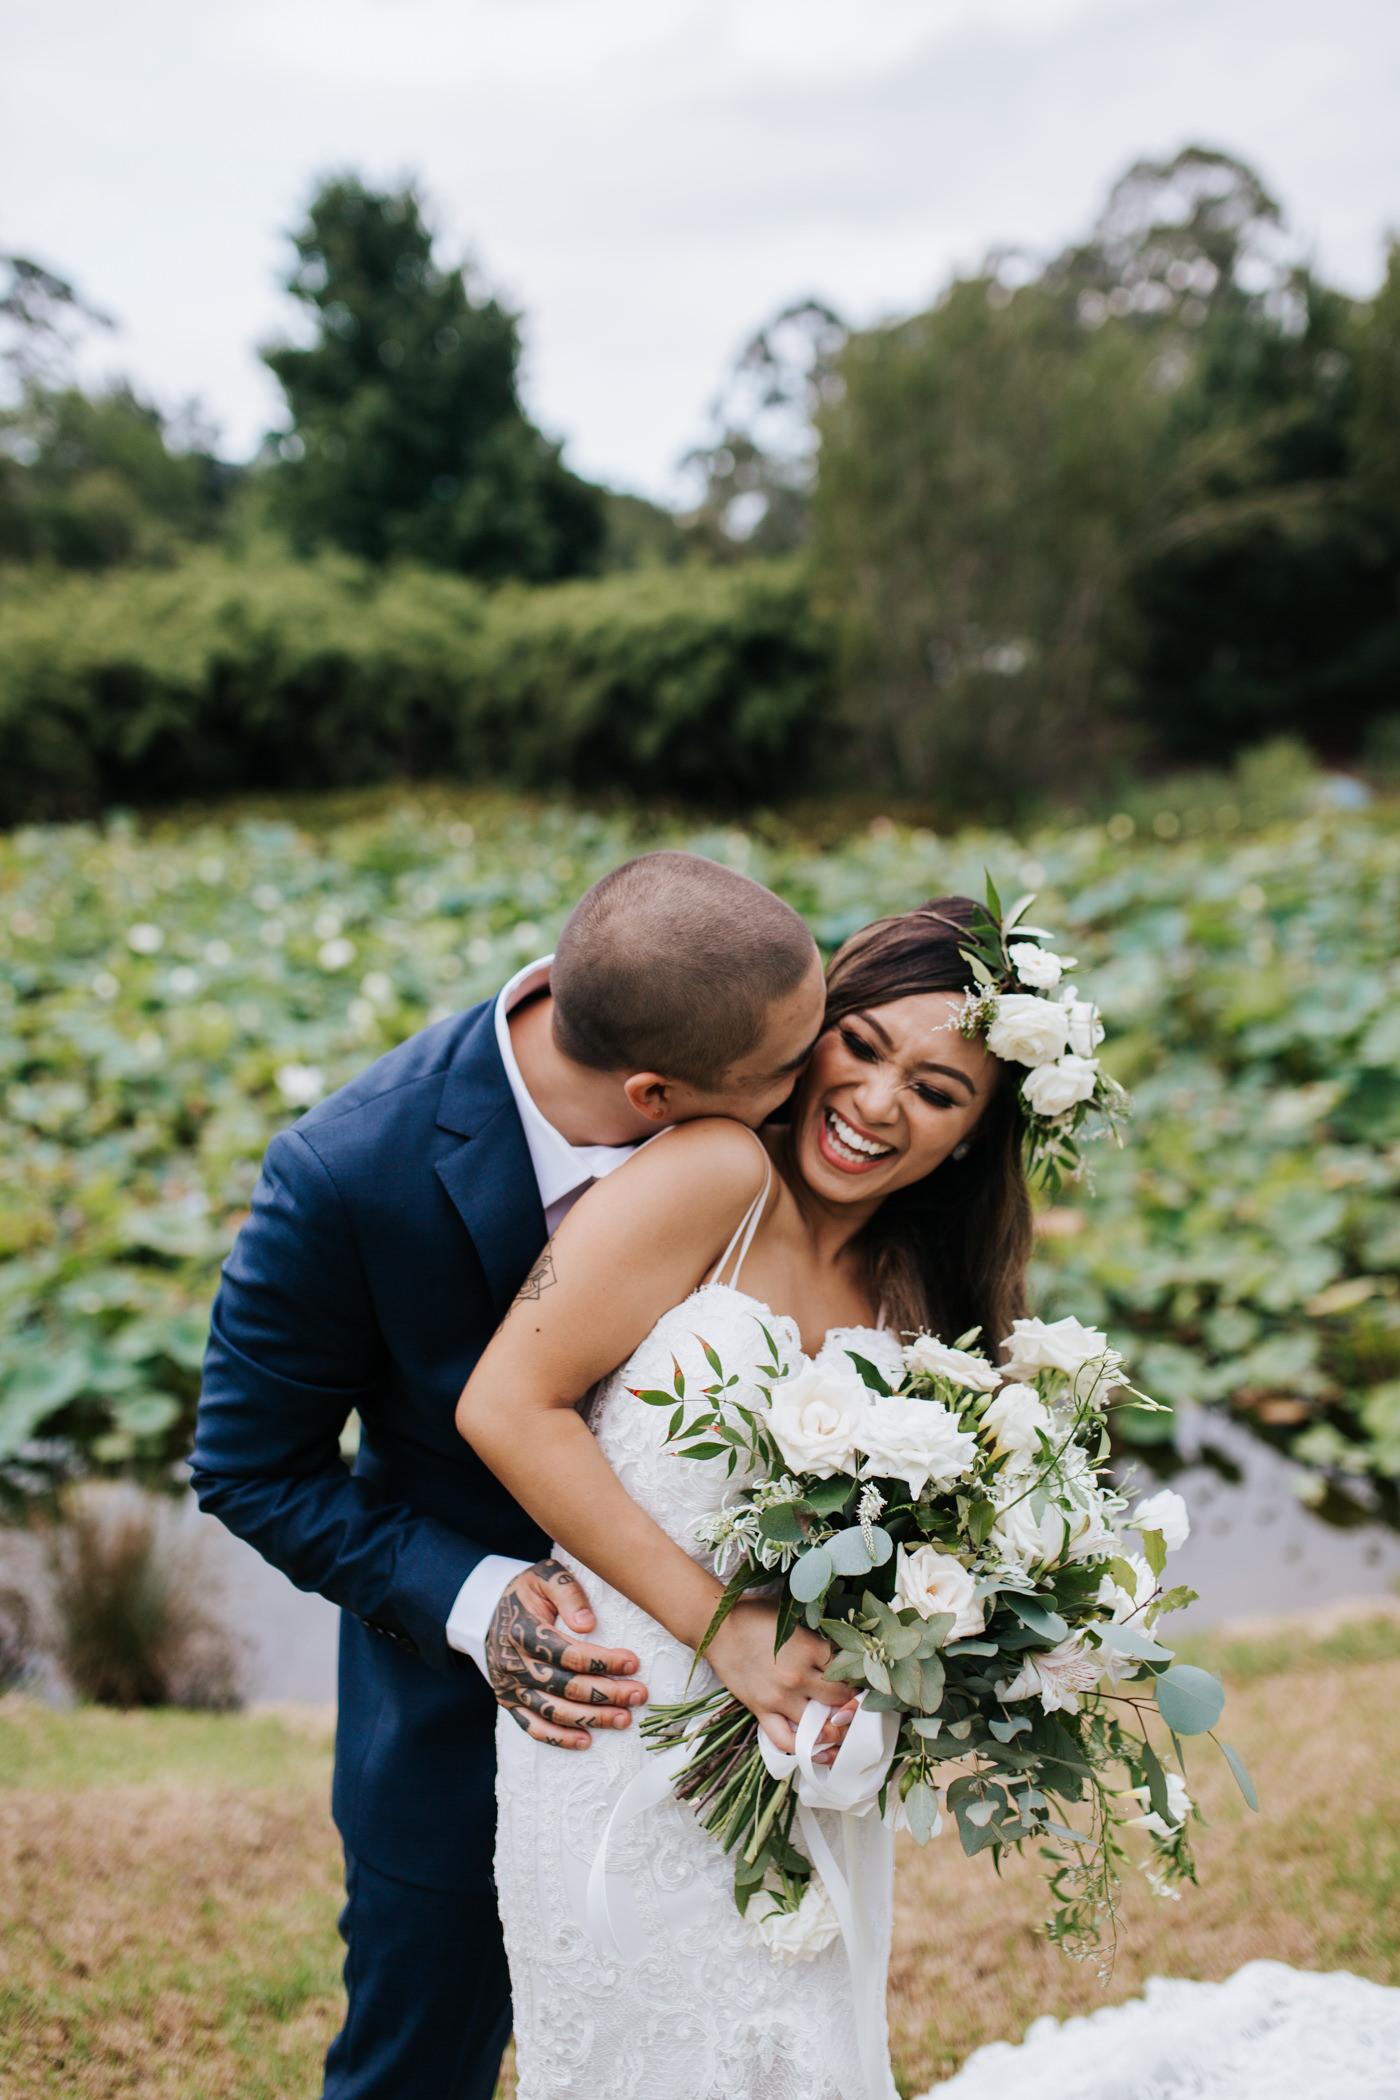 Nick & Vanezza - Fernbank Farm Wedding - Samantha Heather Photography-86.jpg